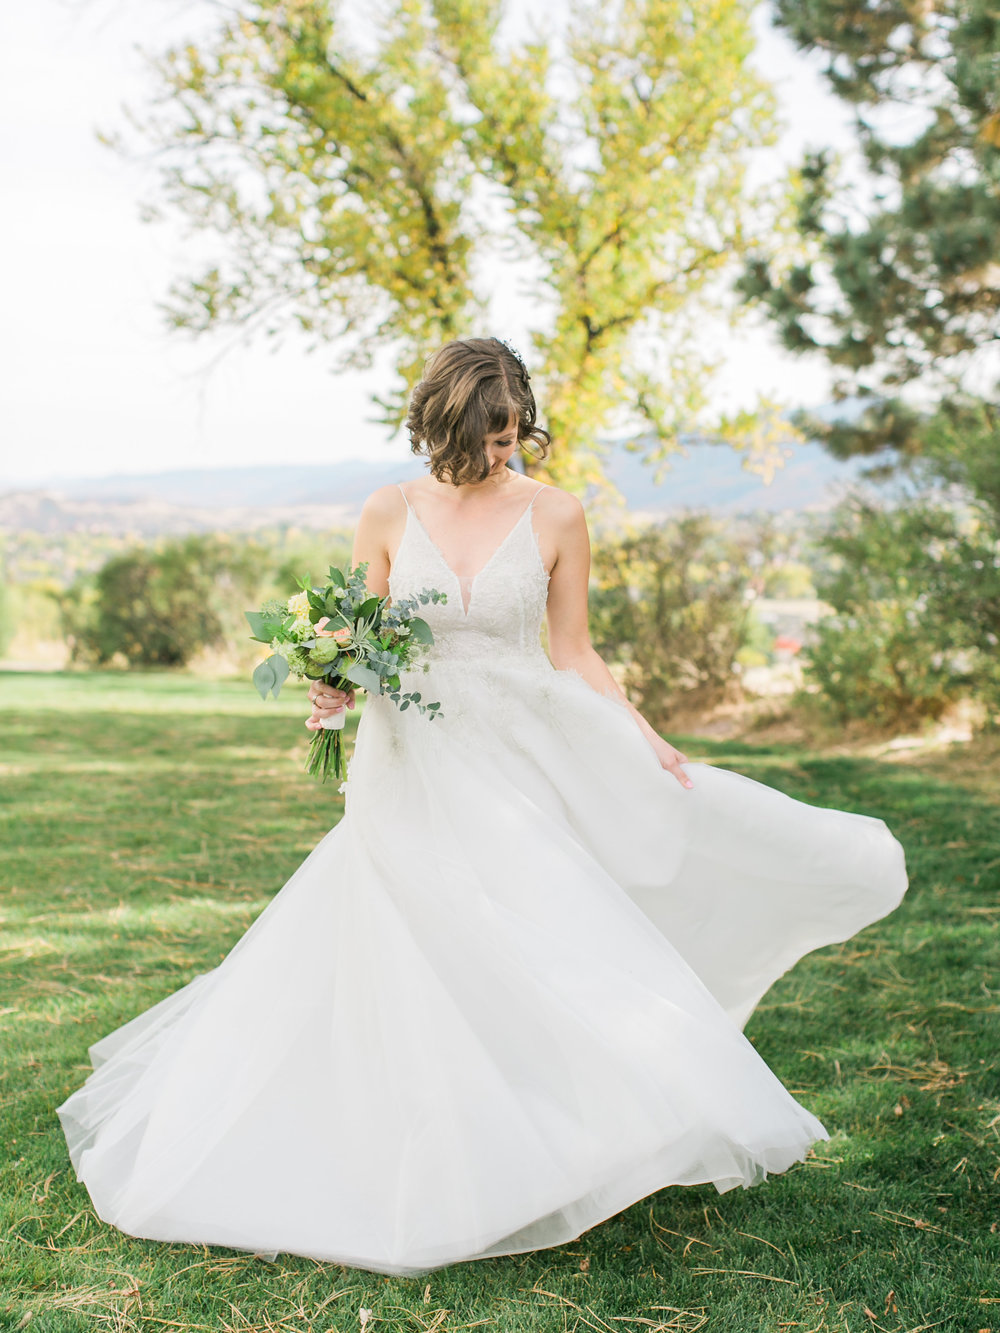 madeline-roberto-wedding-bride-groom-54.jpg